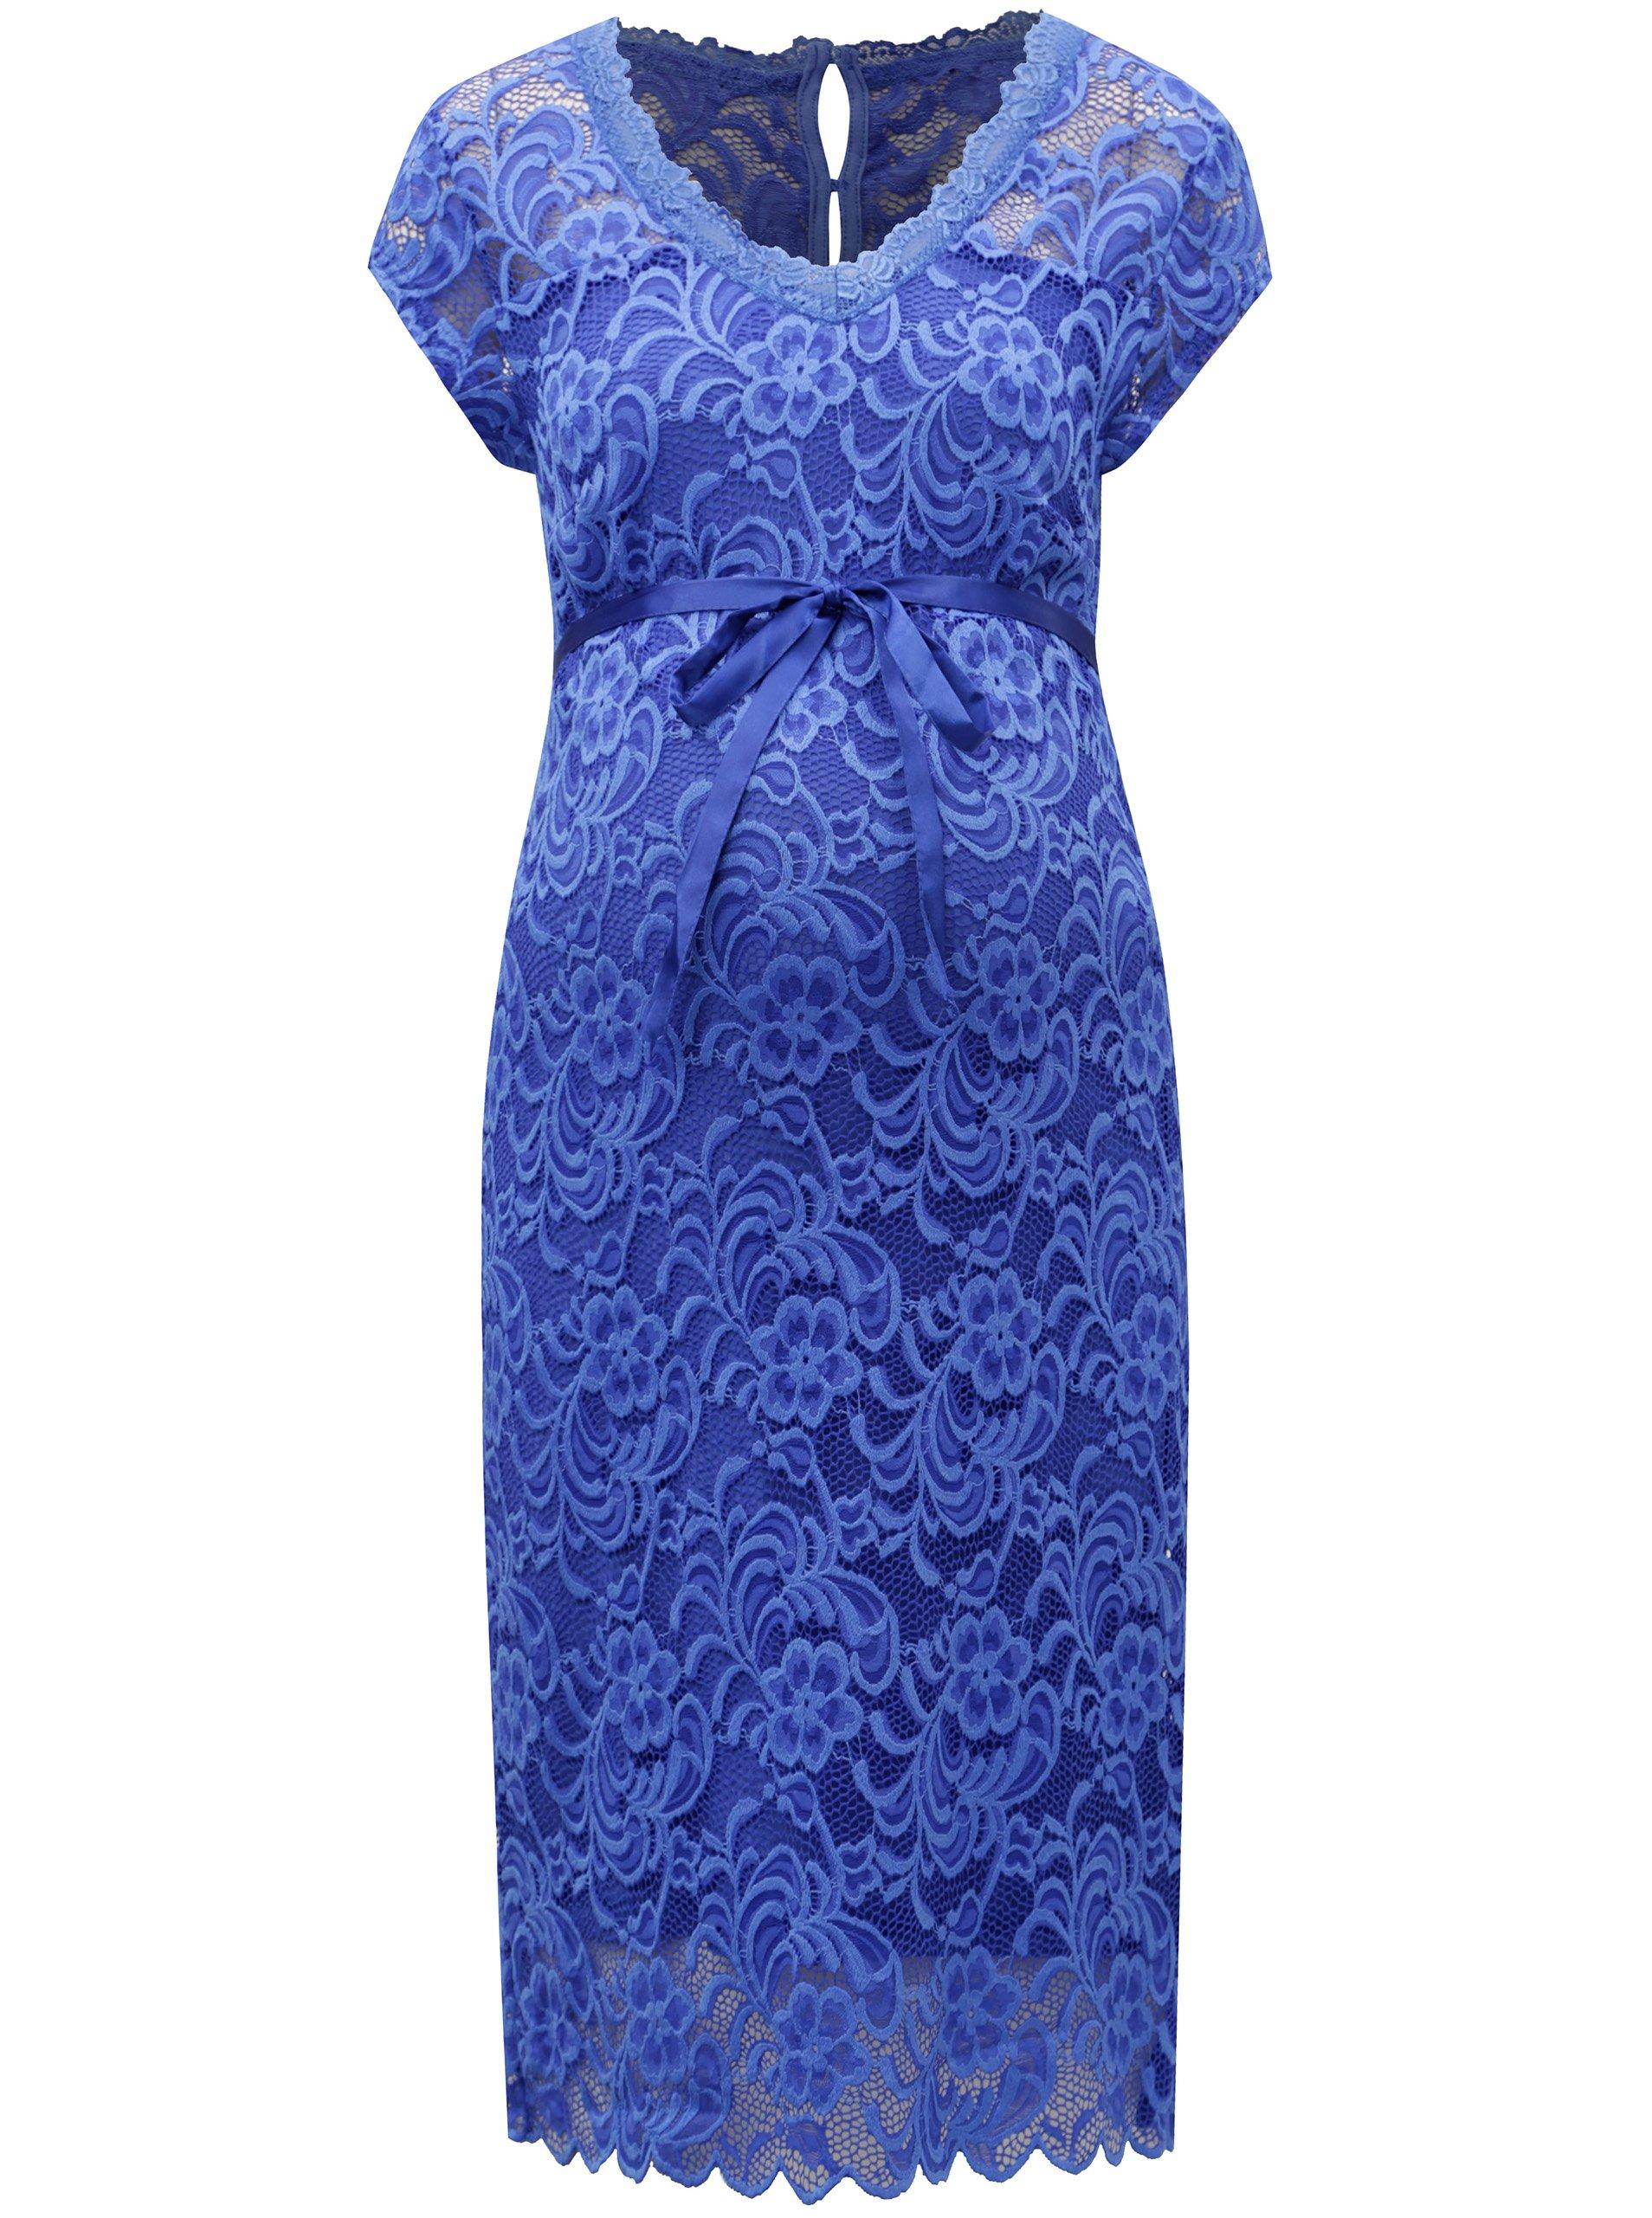 51faea77f214 Modré čipkované tehotenské šaty Mama.licious New mivana